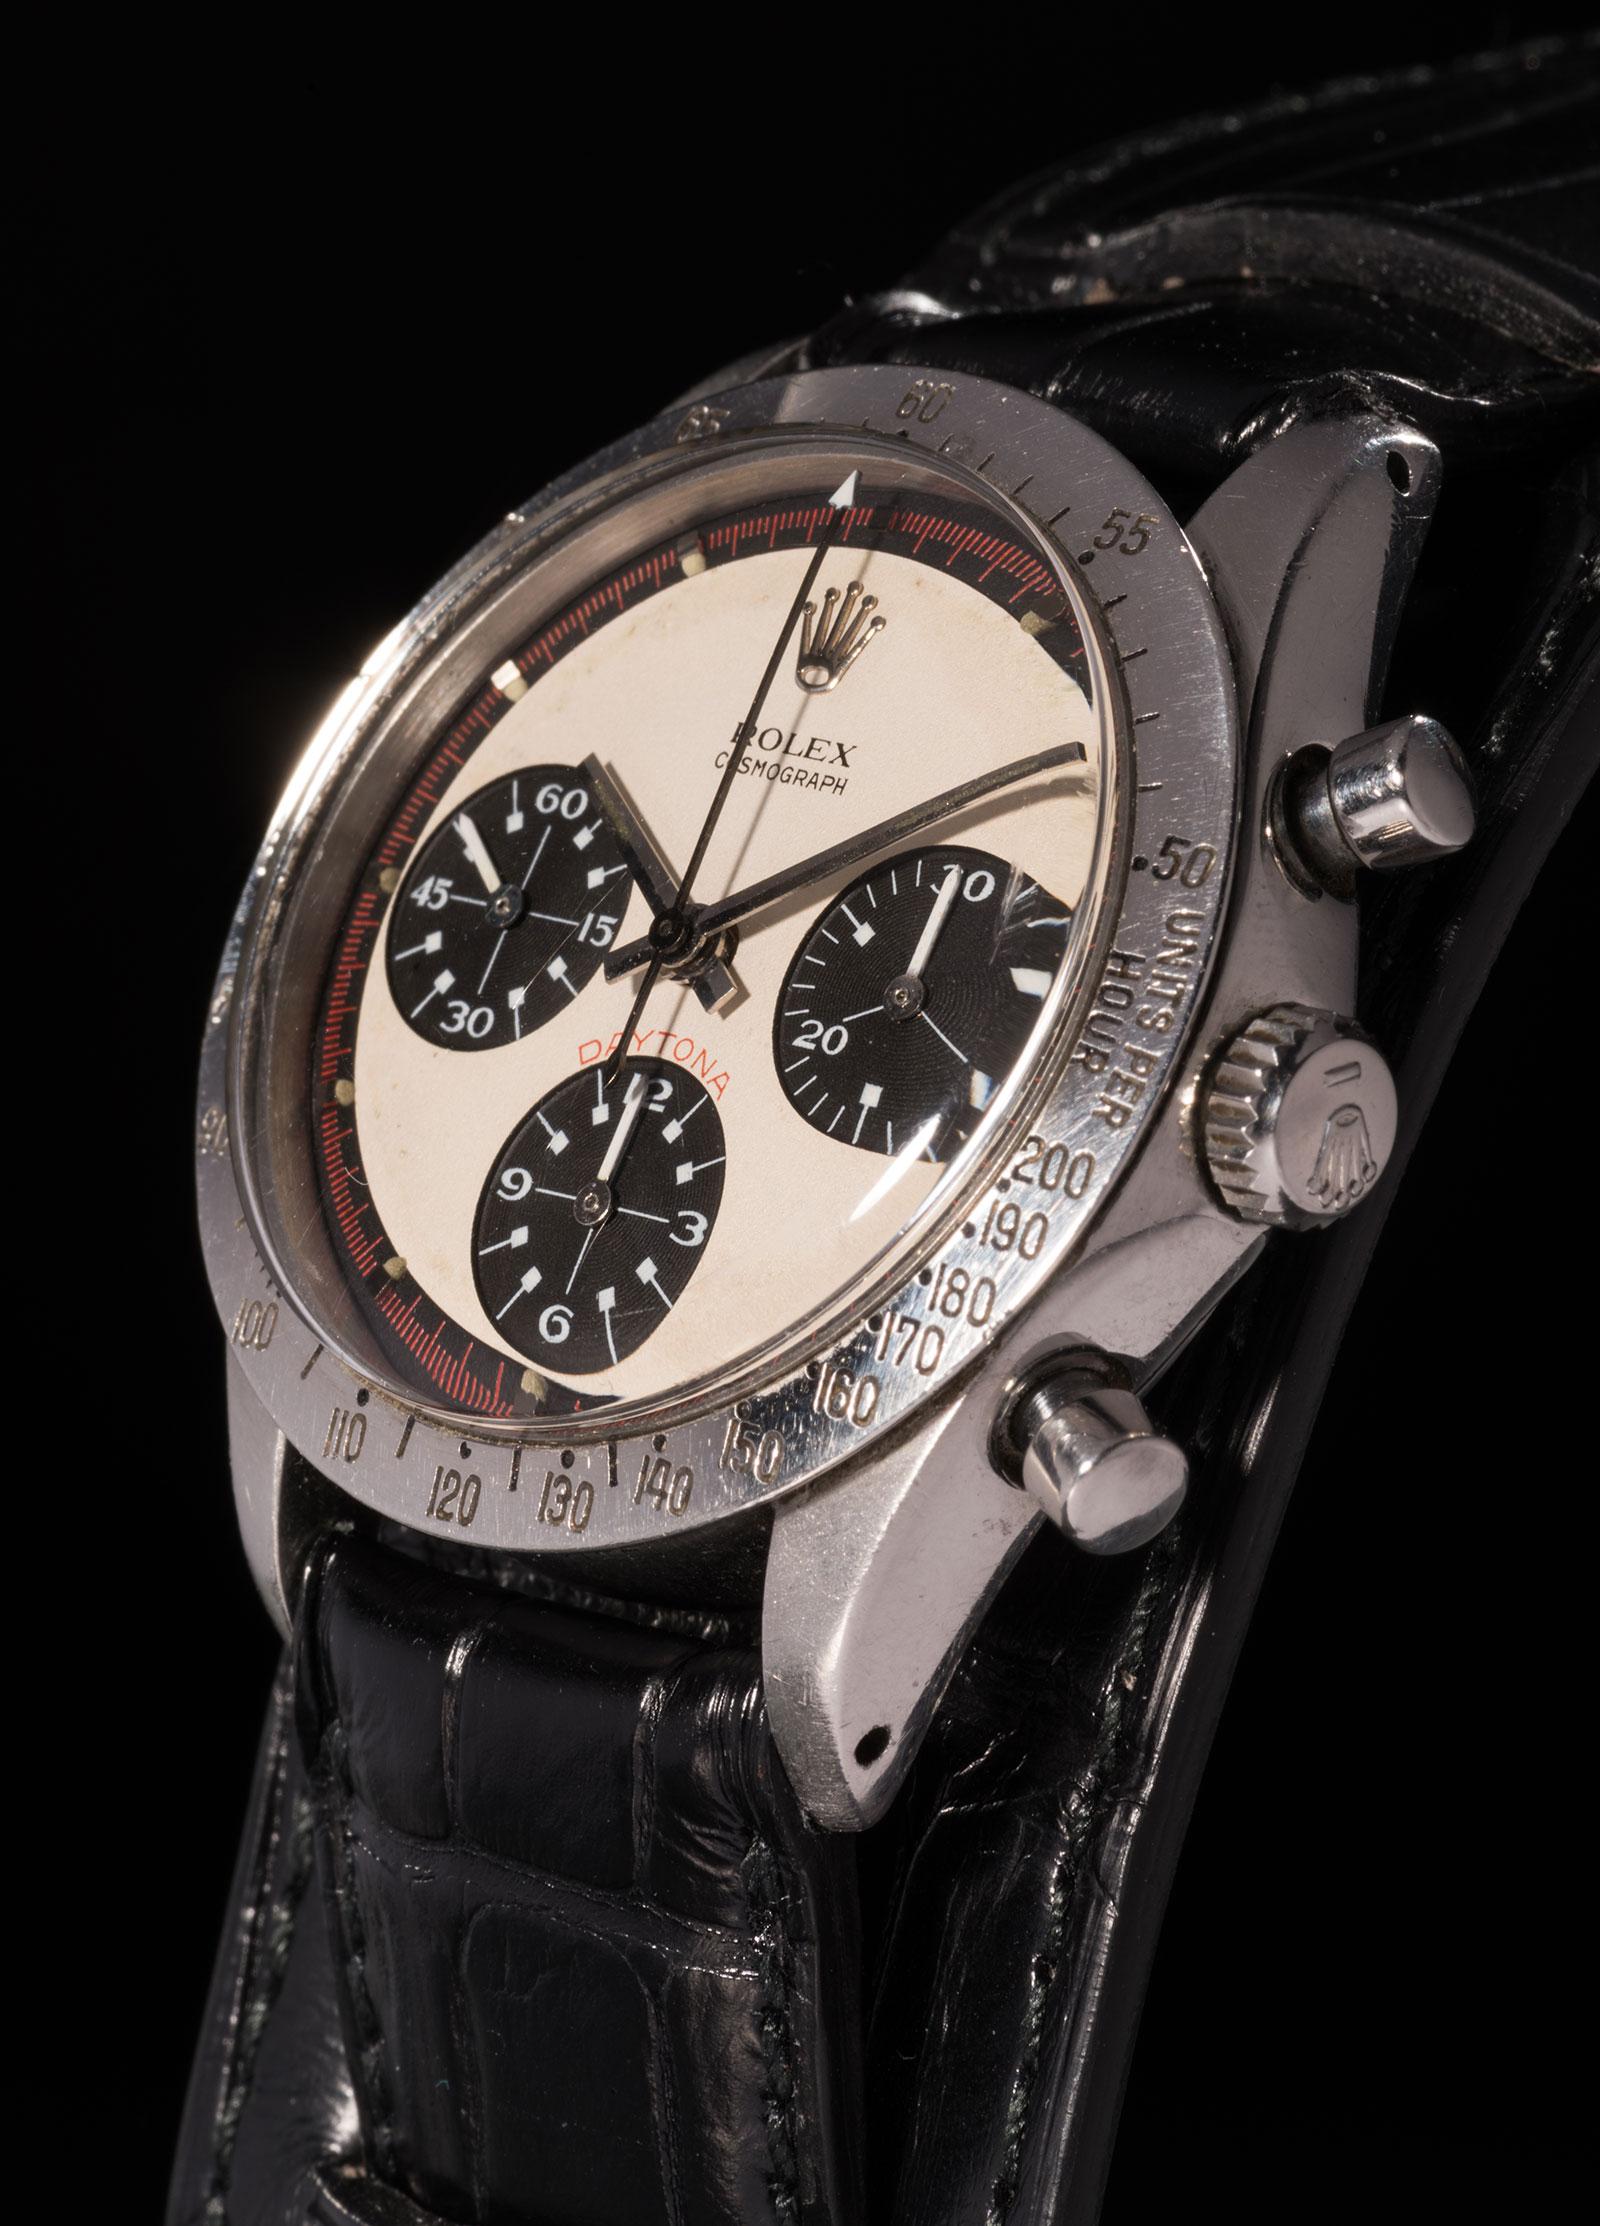 Paul Newman's Paul Newman Rolex 5